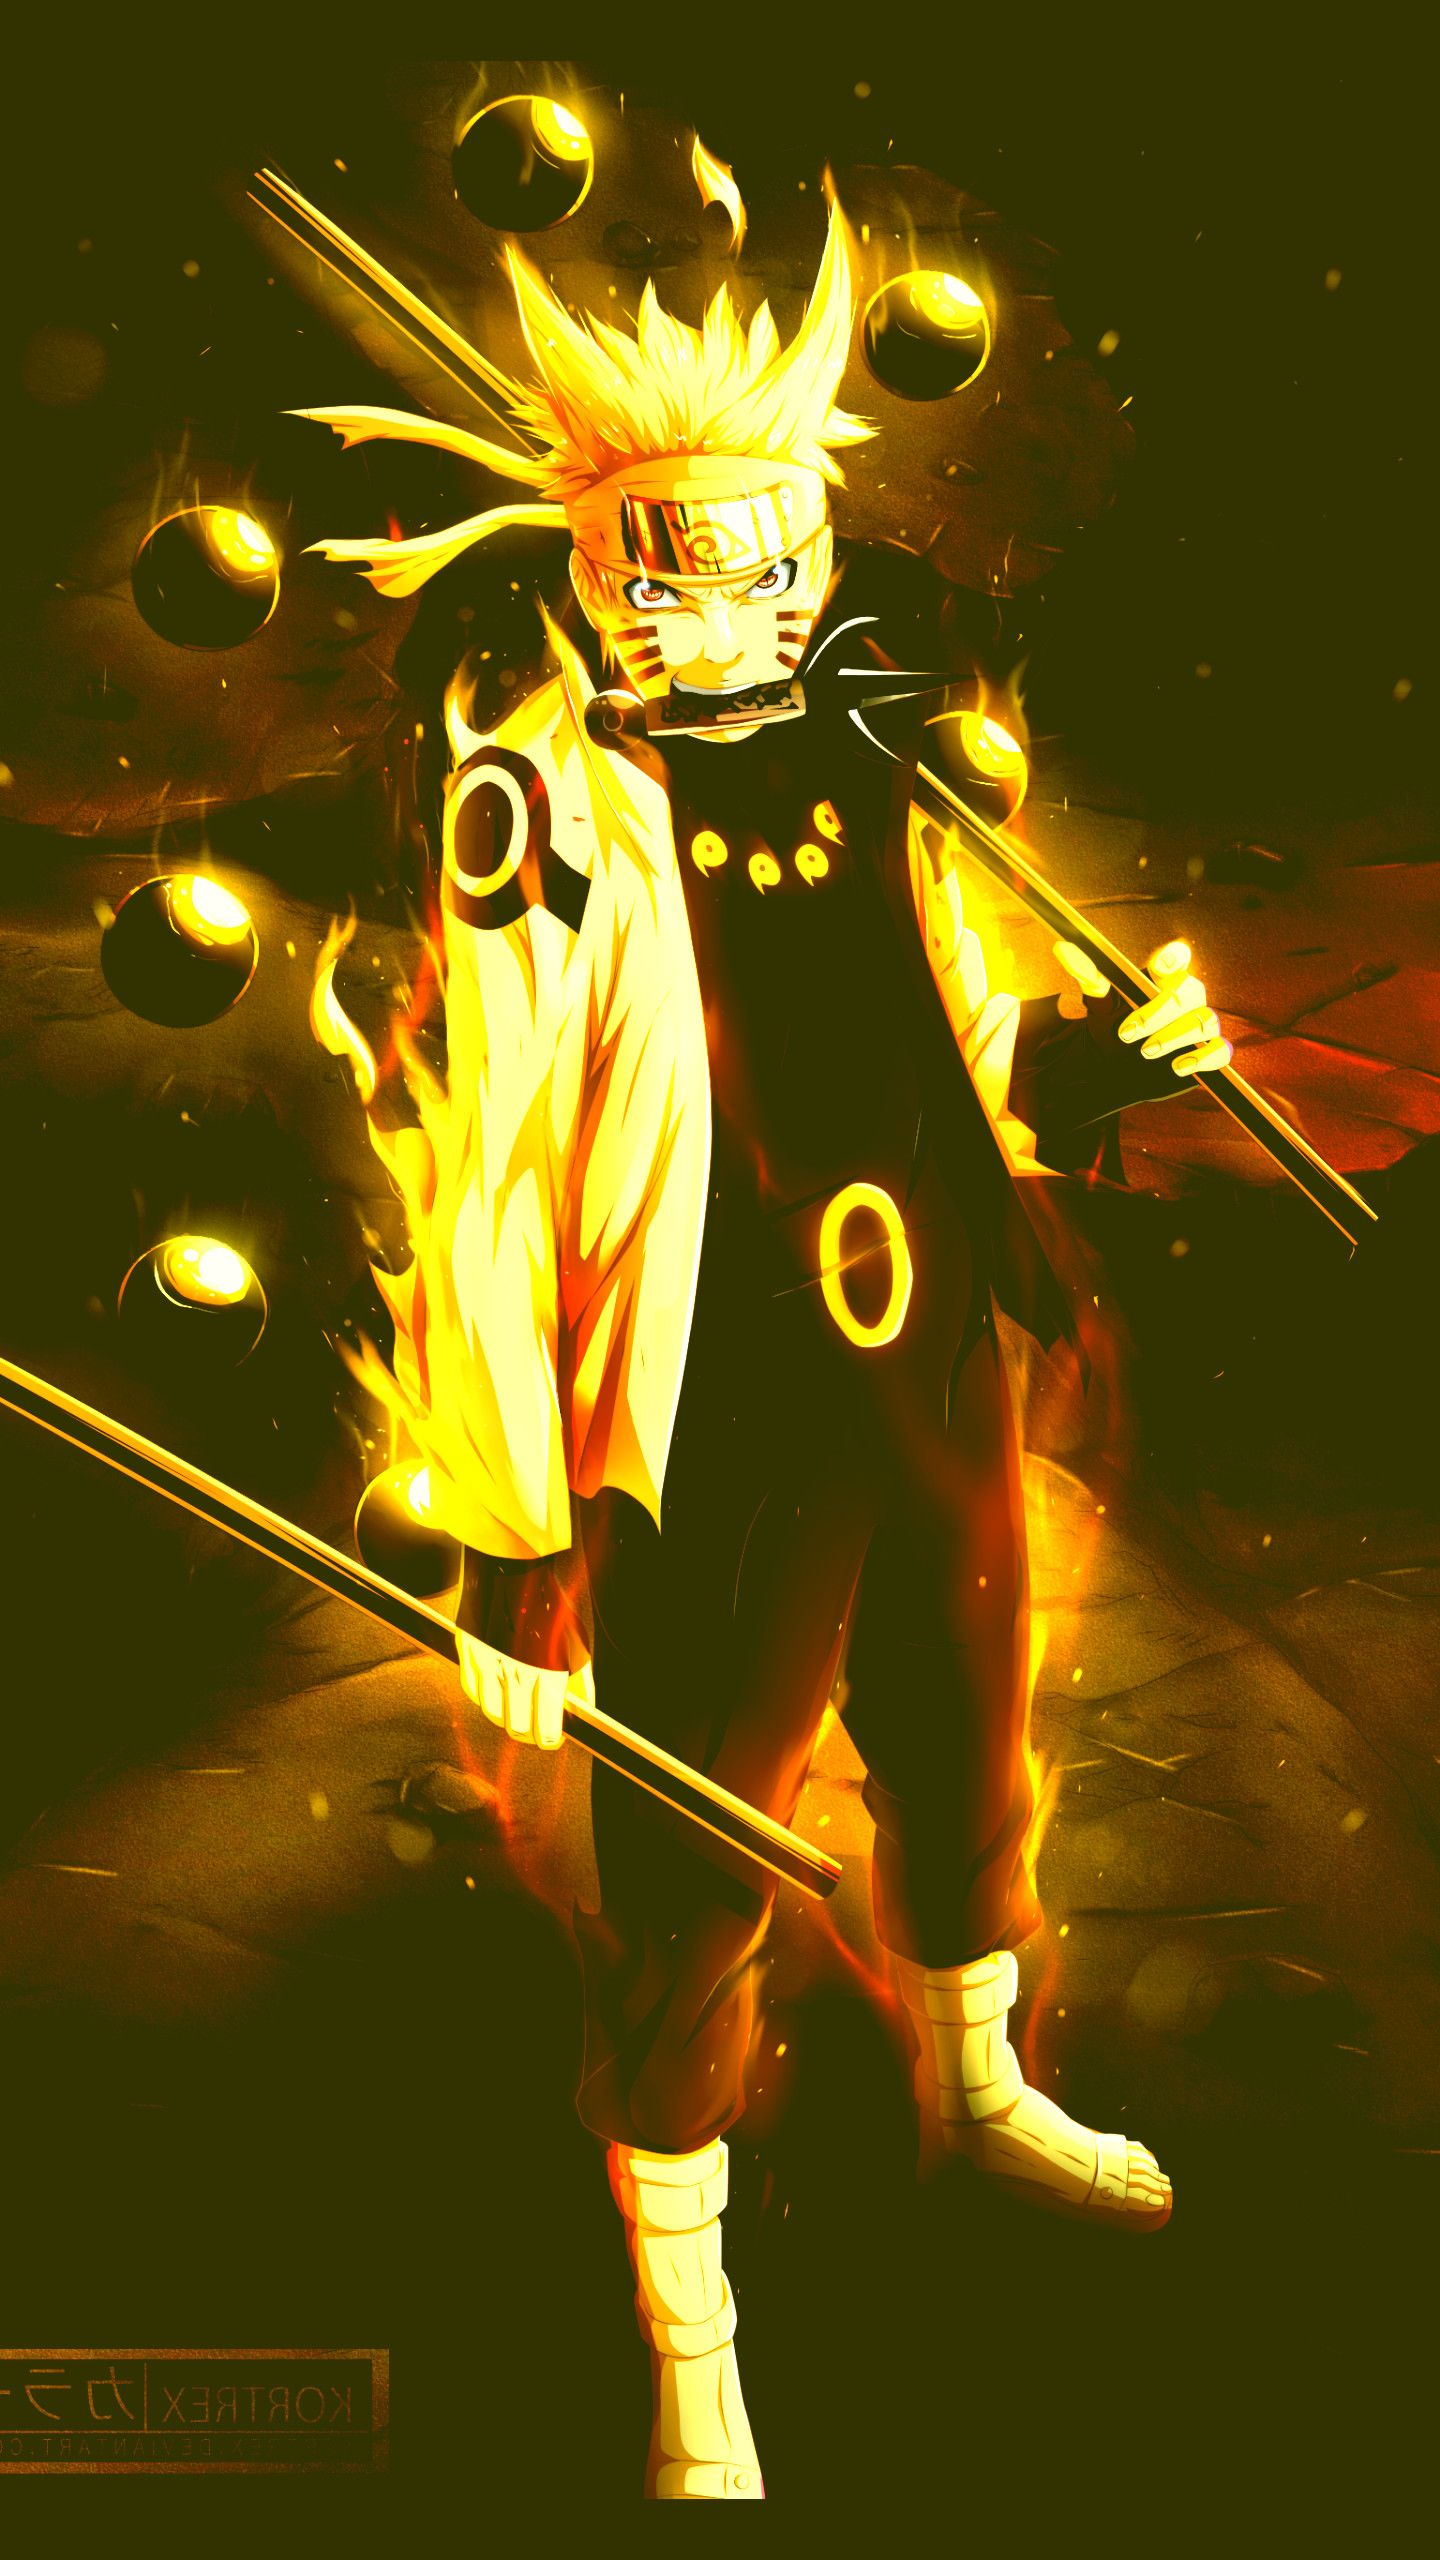 49 ] Naruto IPhone 7 Plus Wallpaper On WallpaperSafari